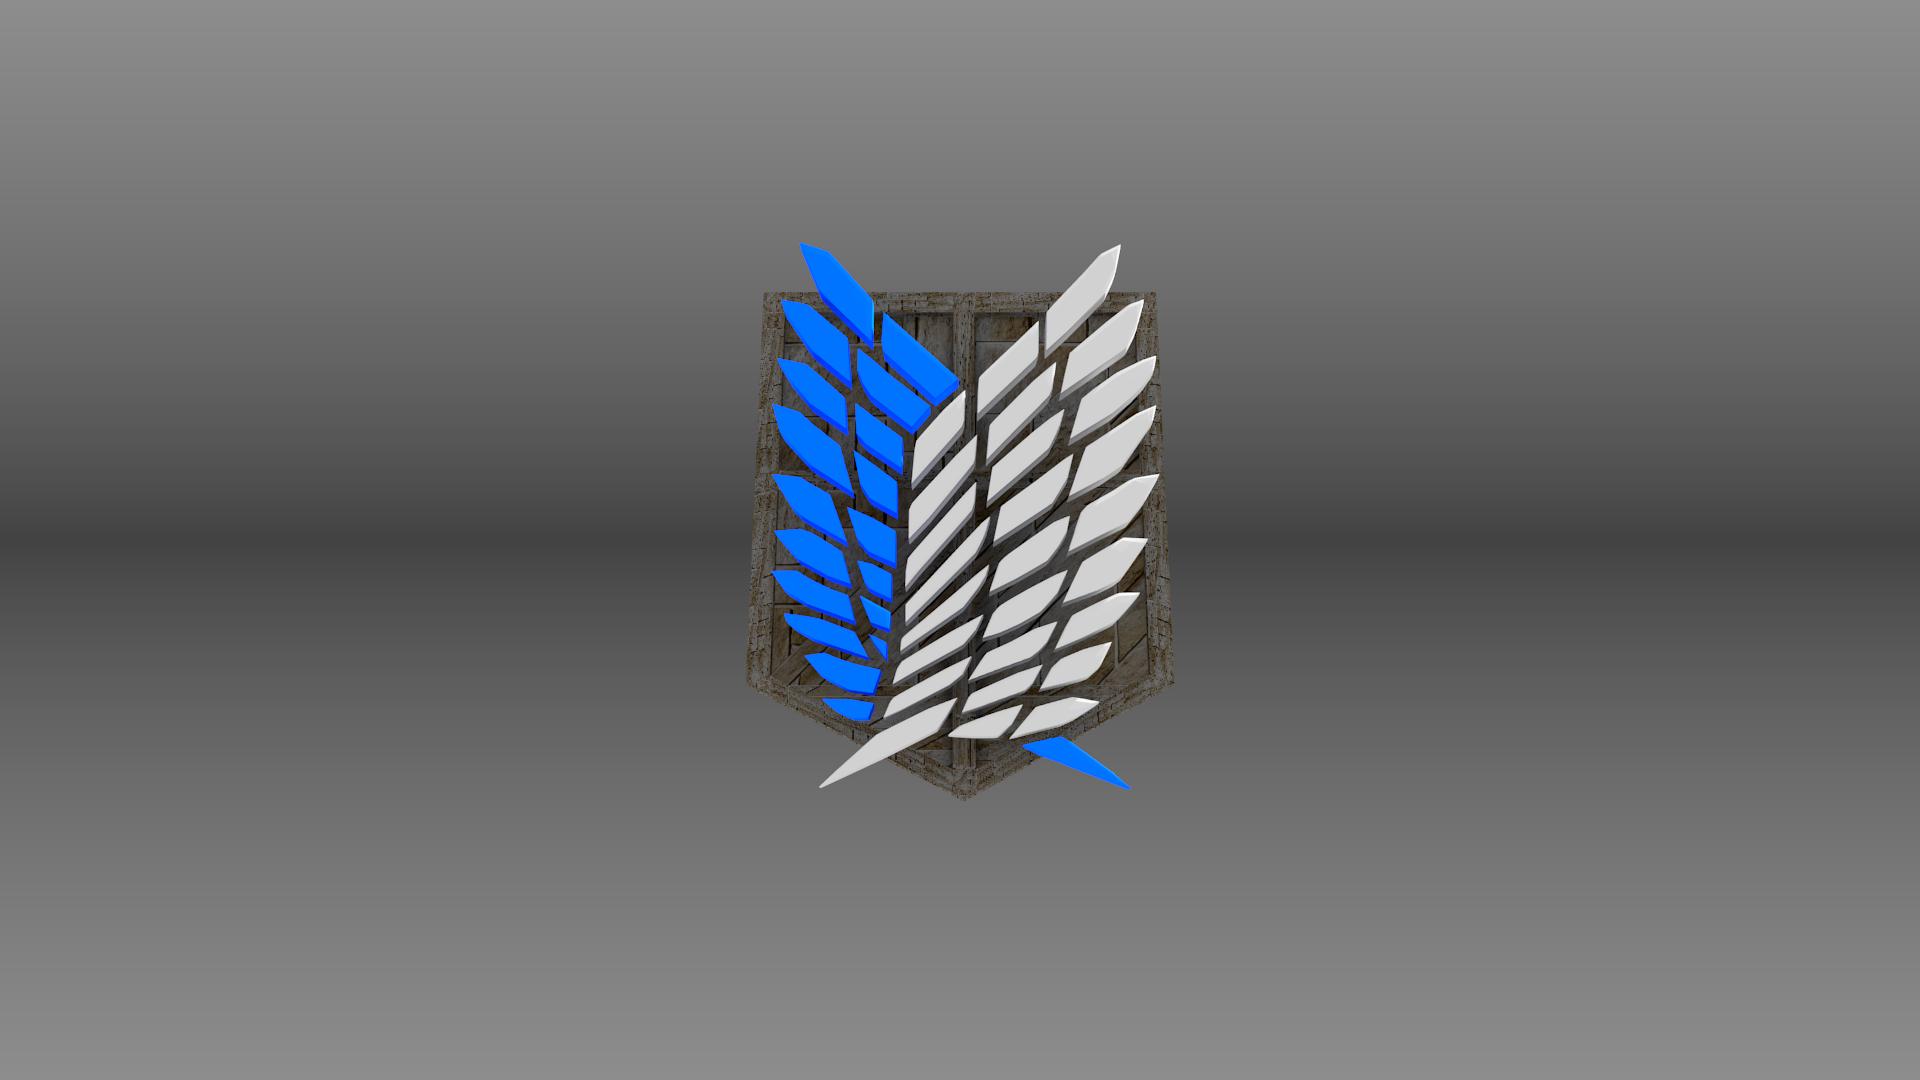 Attack On Titan Scouts Emblem Wallpaper By Aeropulse On Deviantart